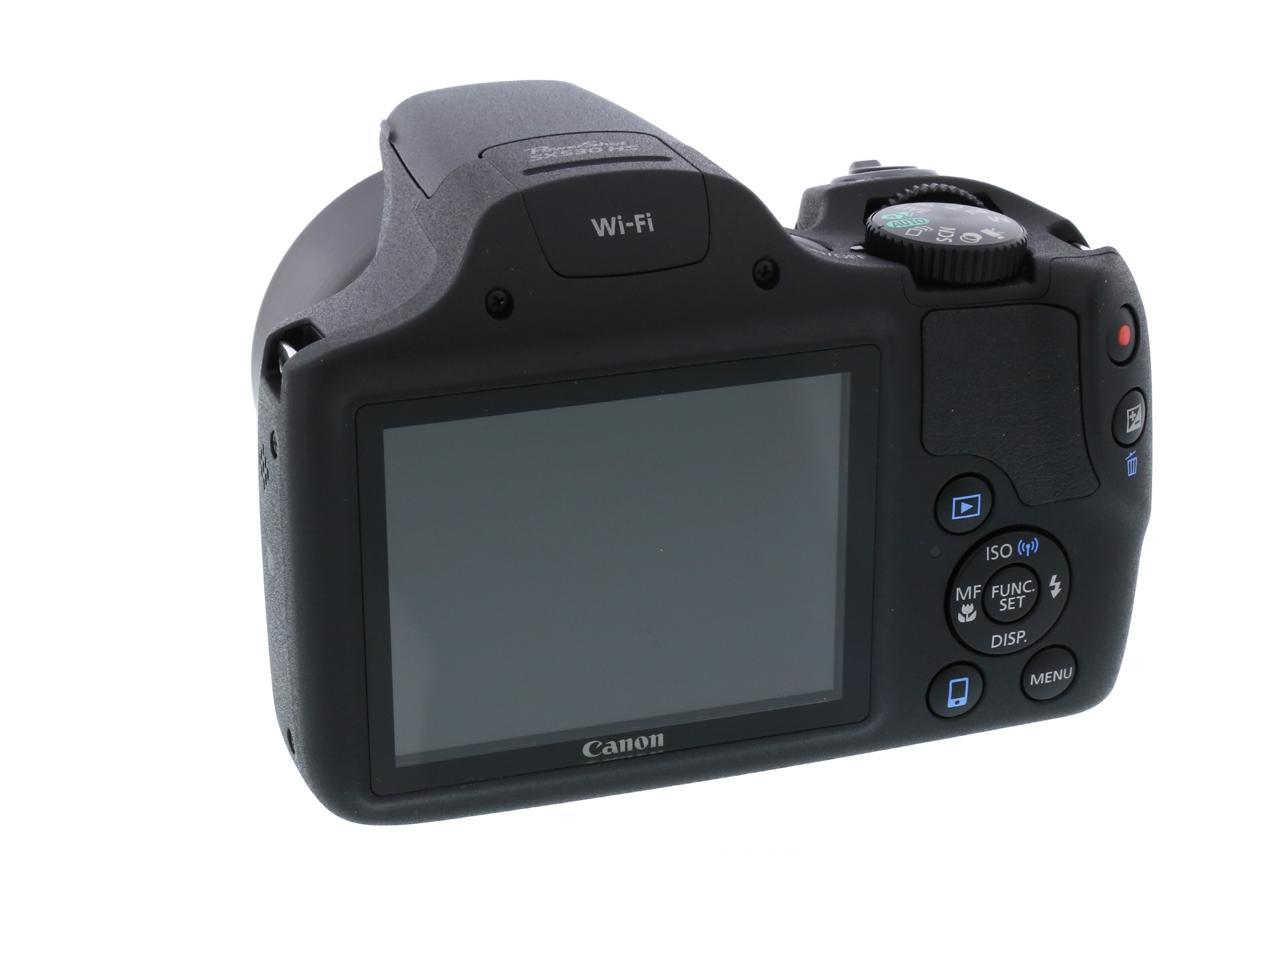 Memory Cards 2 Pack SDHC Samsung WB850F Digital Camera Memory Card 2 x 32GB Secure Digital High Capacity